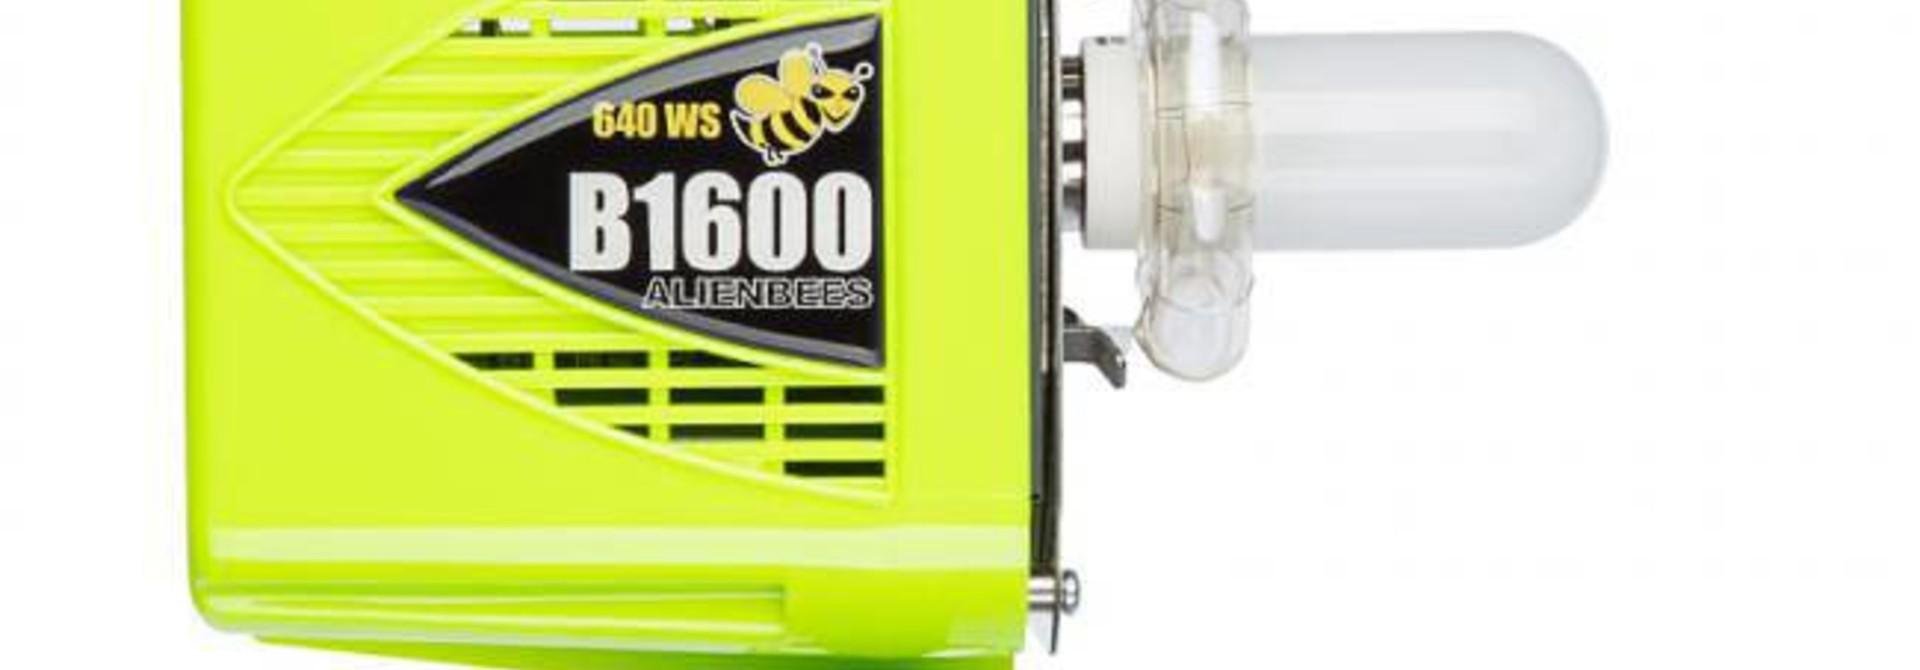 AlienBees Flash Unit B1600